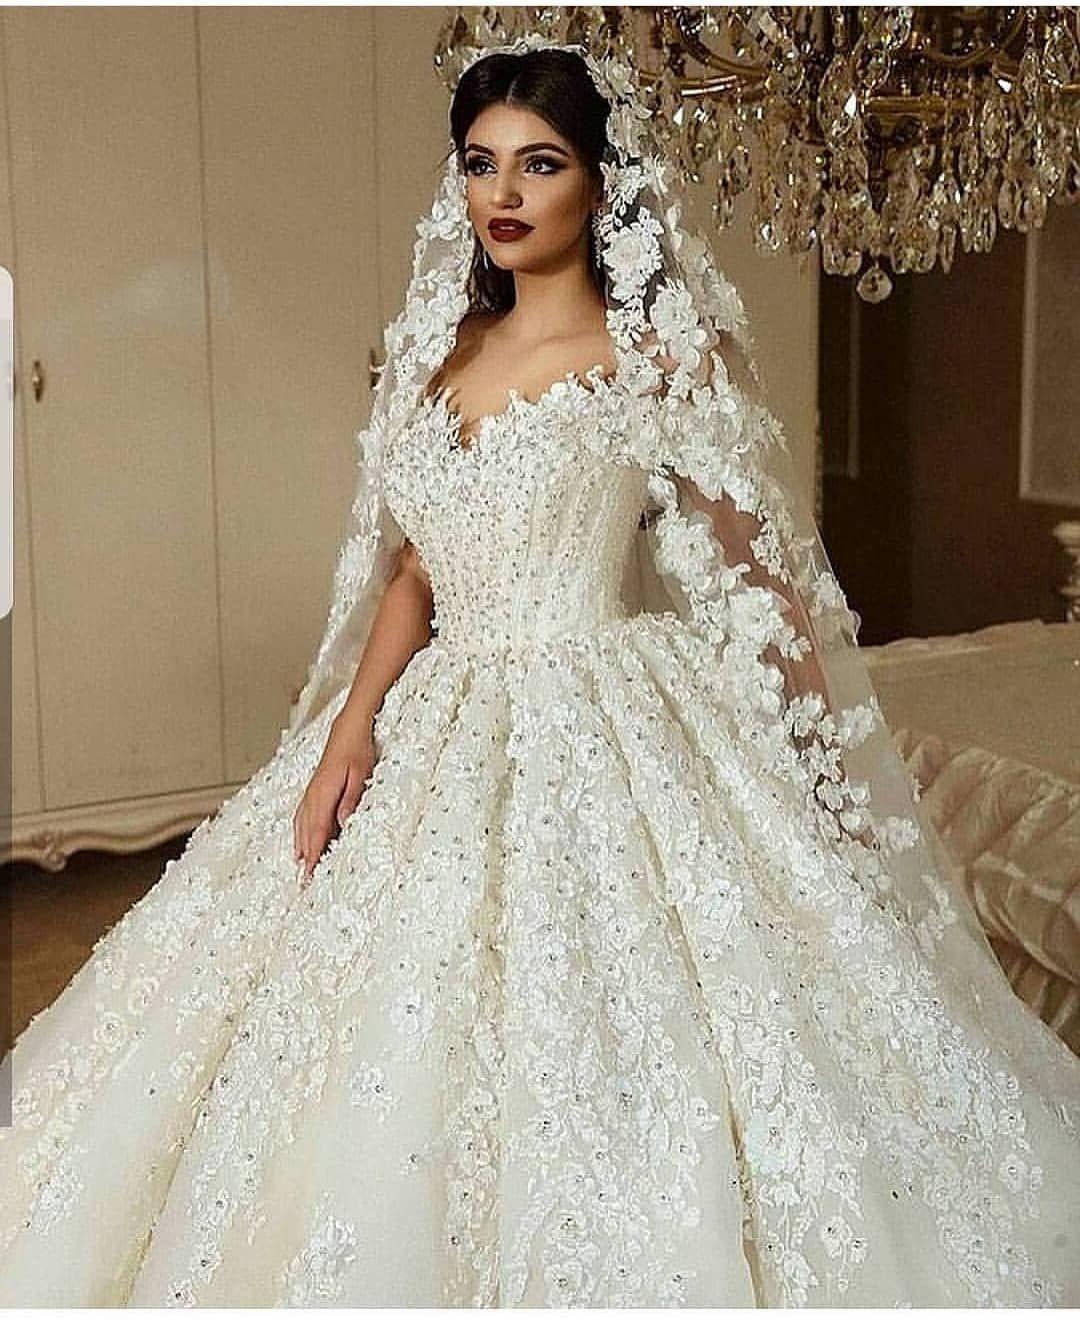 Designer Wedding Gowns For Less: USA Dress Designer In 2019